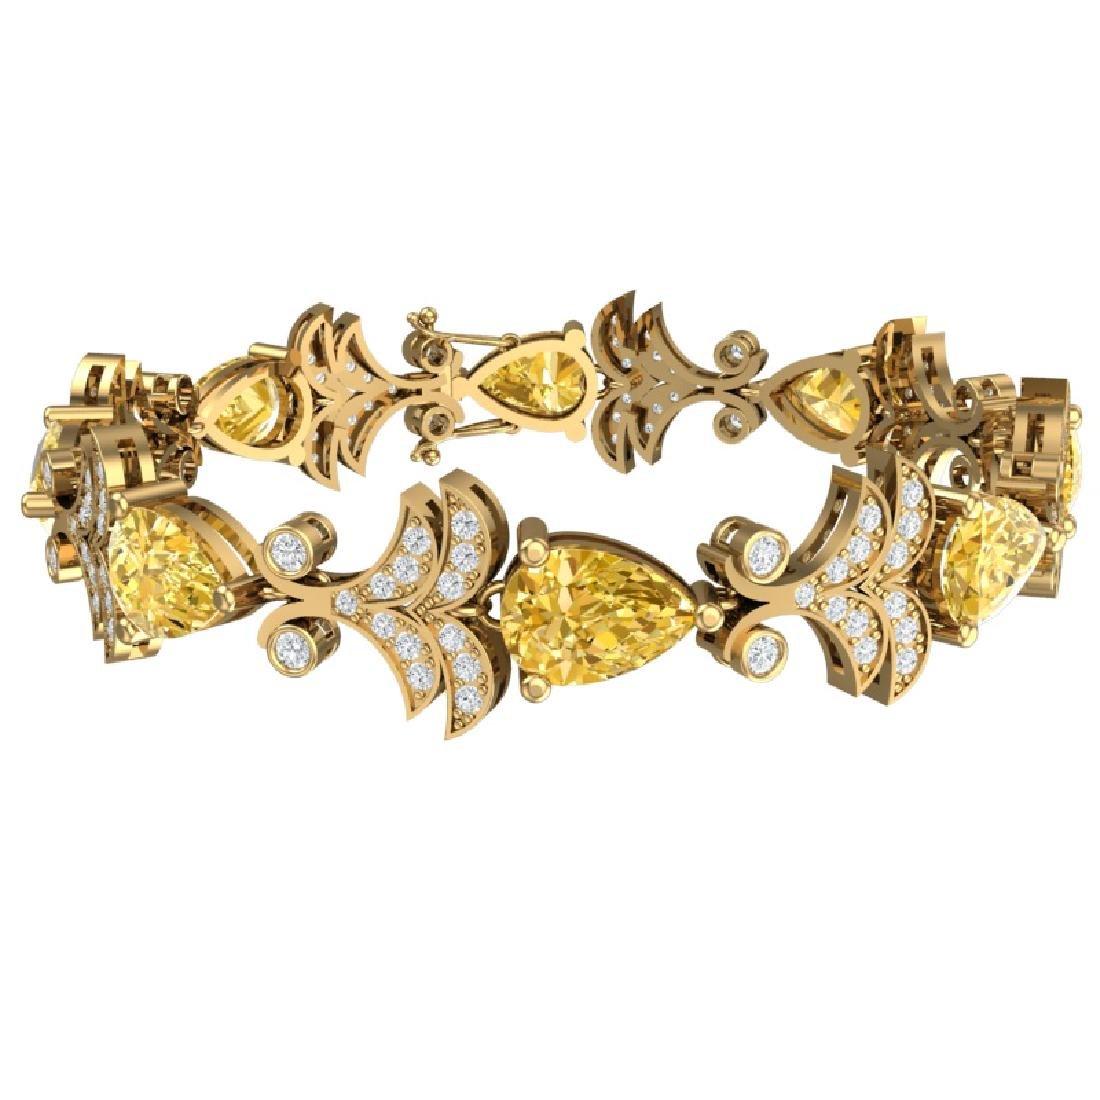 23.66 CTW Royalty Canary Citrine & VS Diamond Bracelet - 3